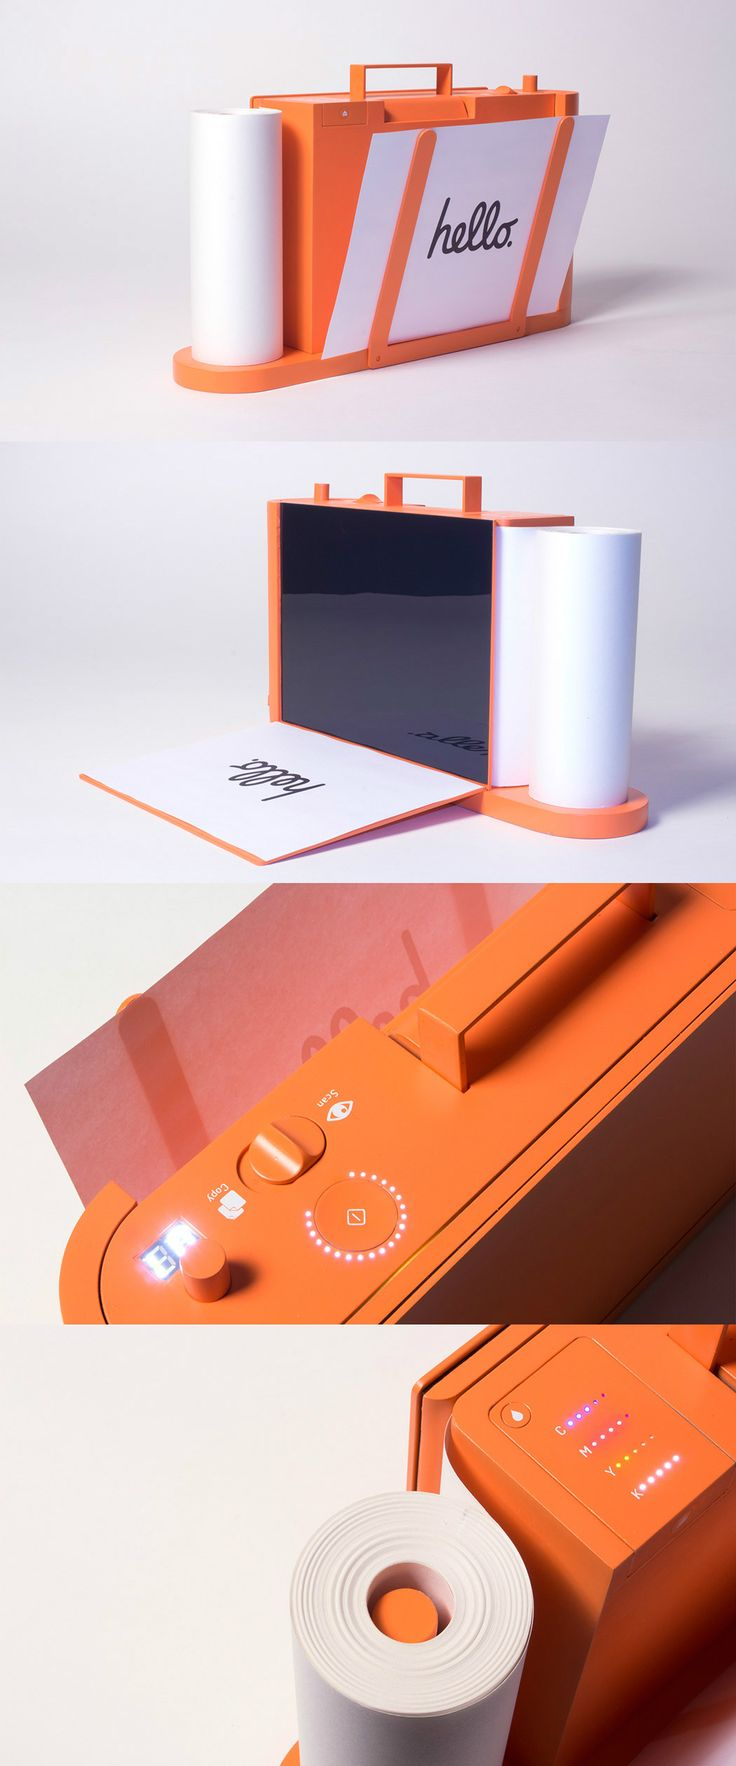 A Printer You Won't Despise! READ FULL STORY AT YANKO DESIGN